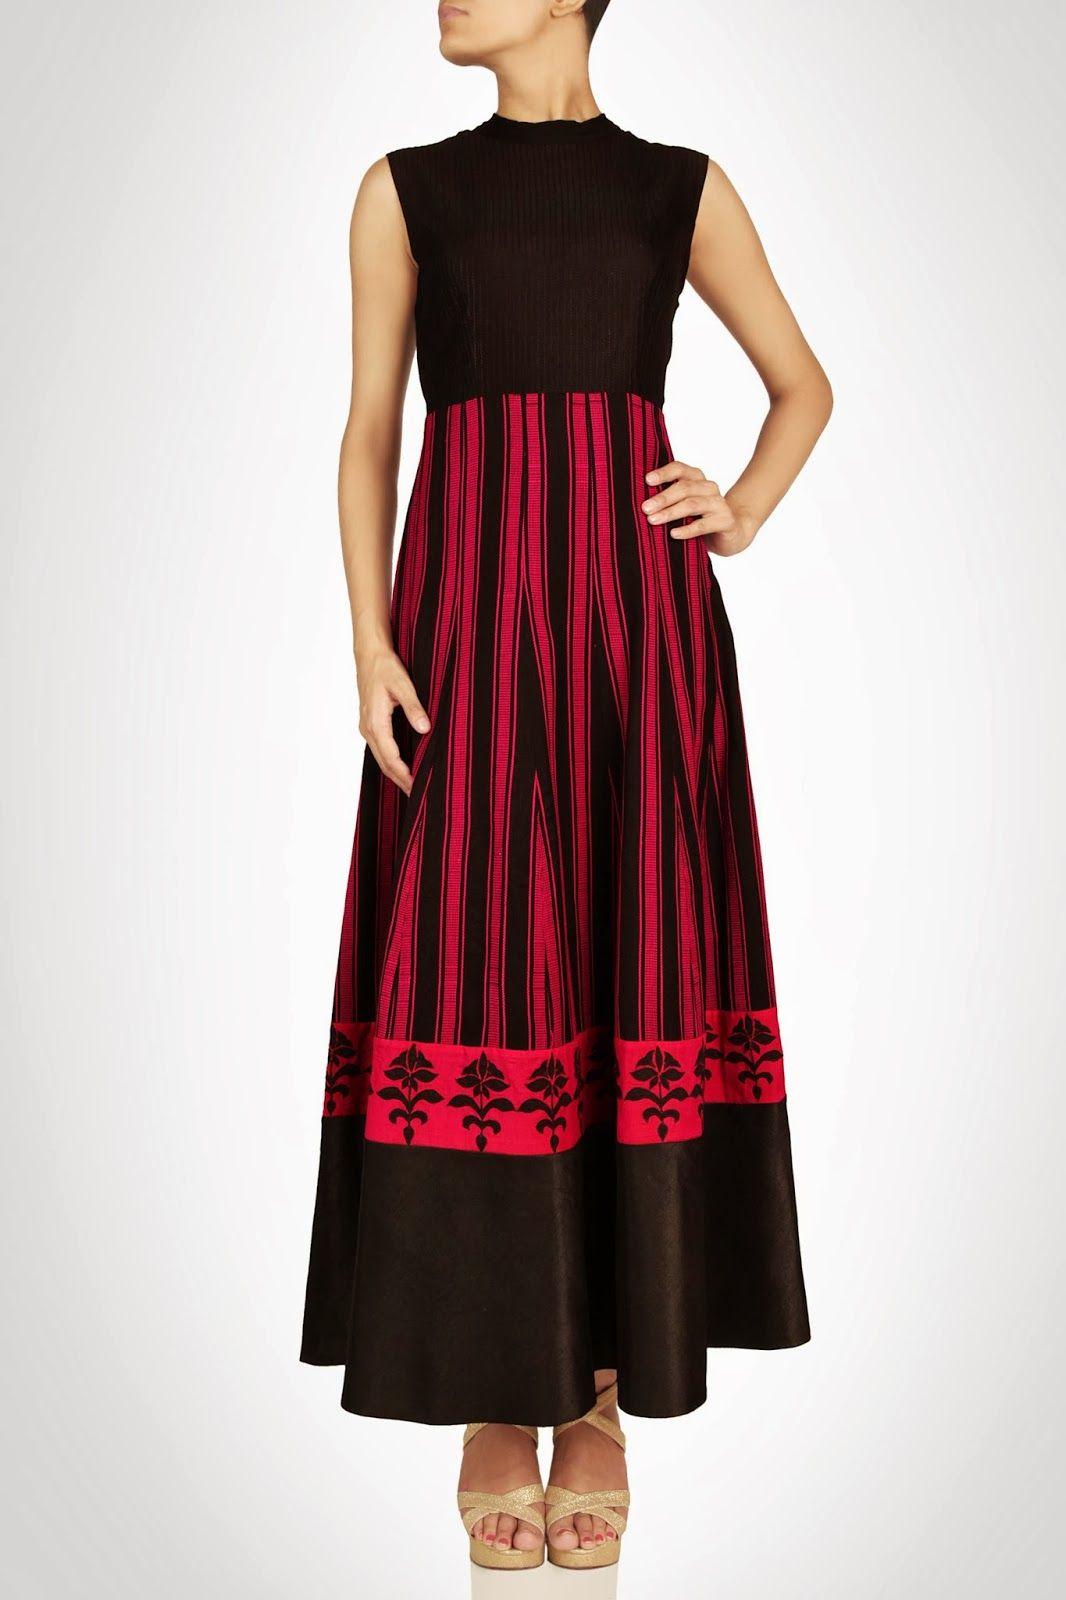 Debashri Samanta   Maxi dress collection, Dresses, Maxi dress